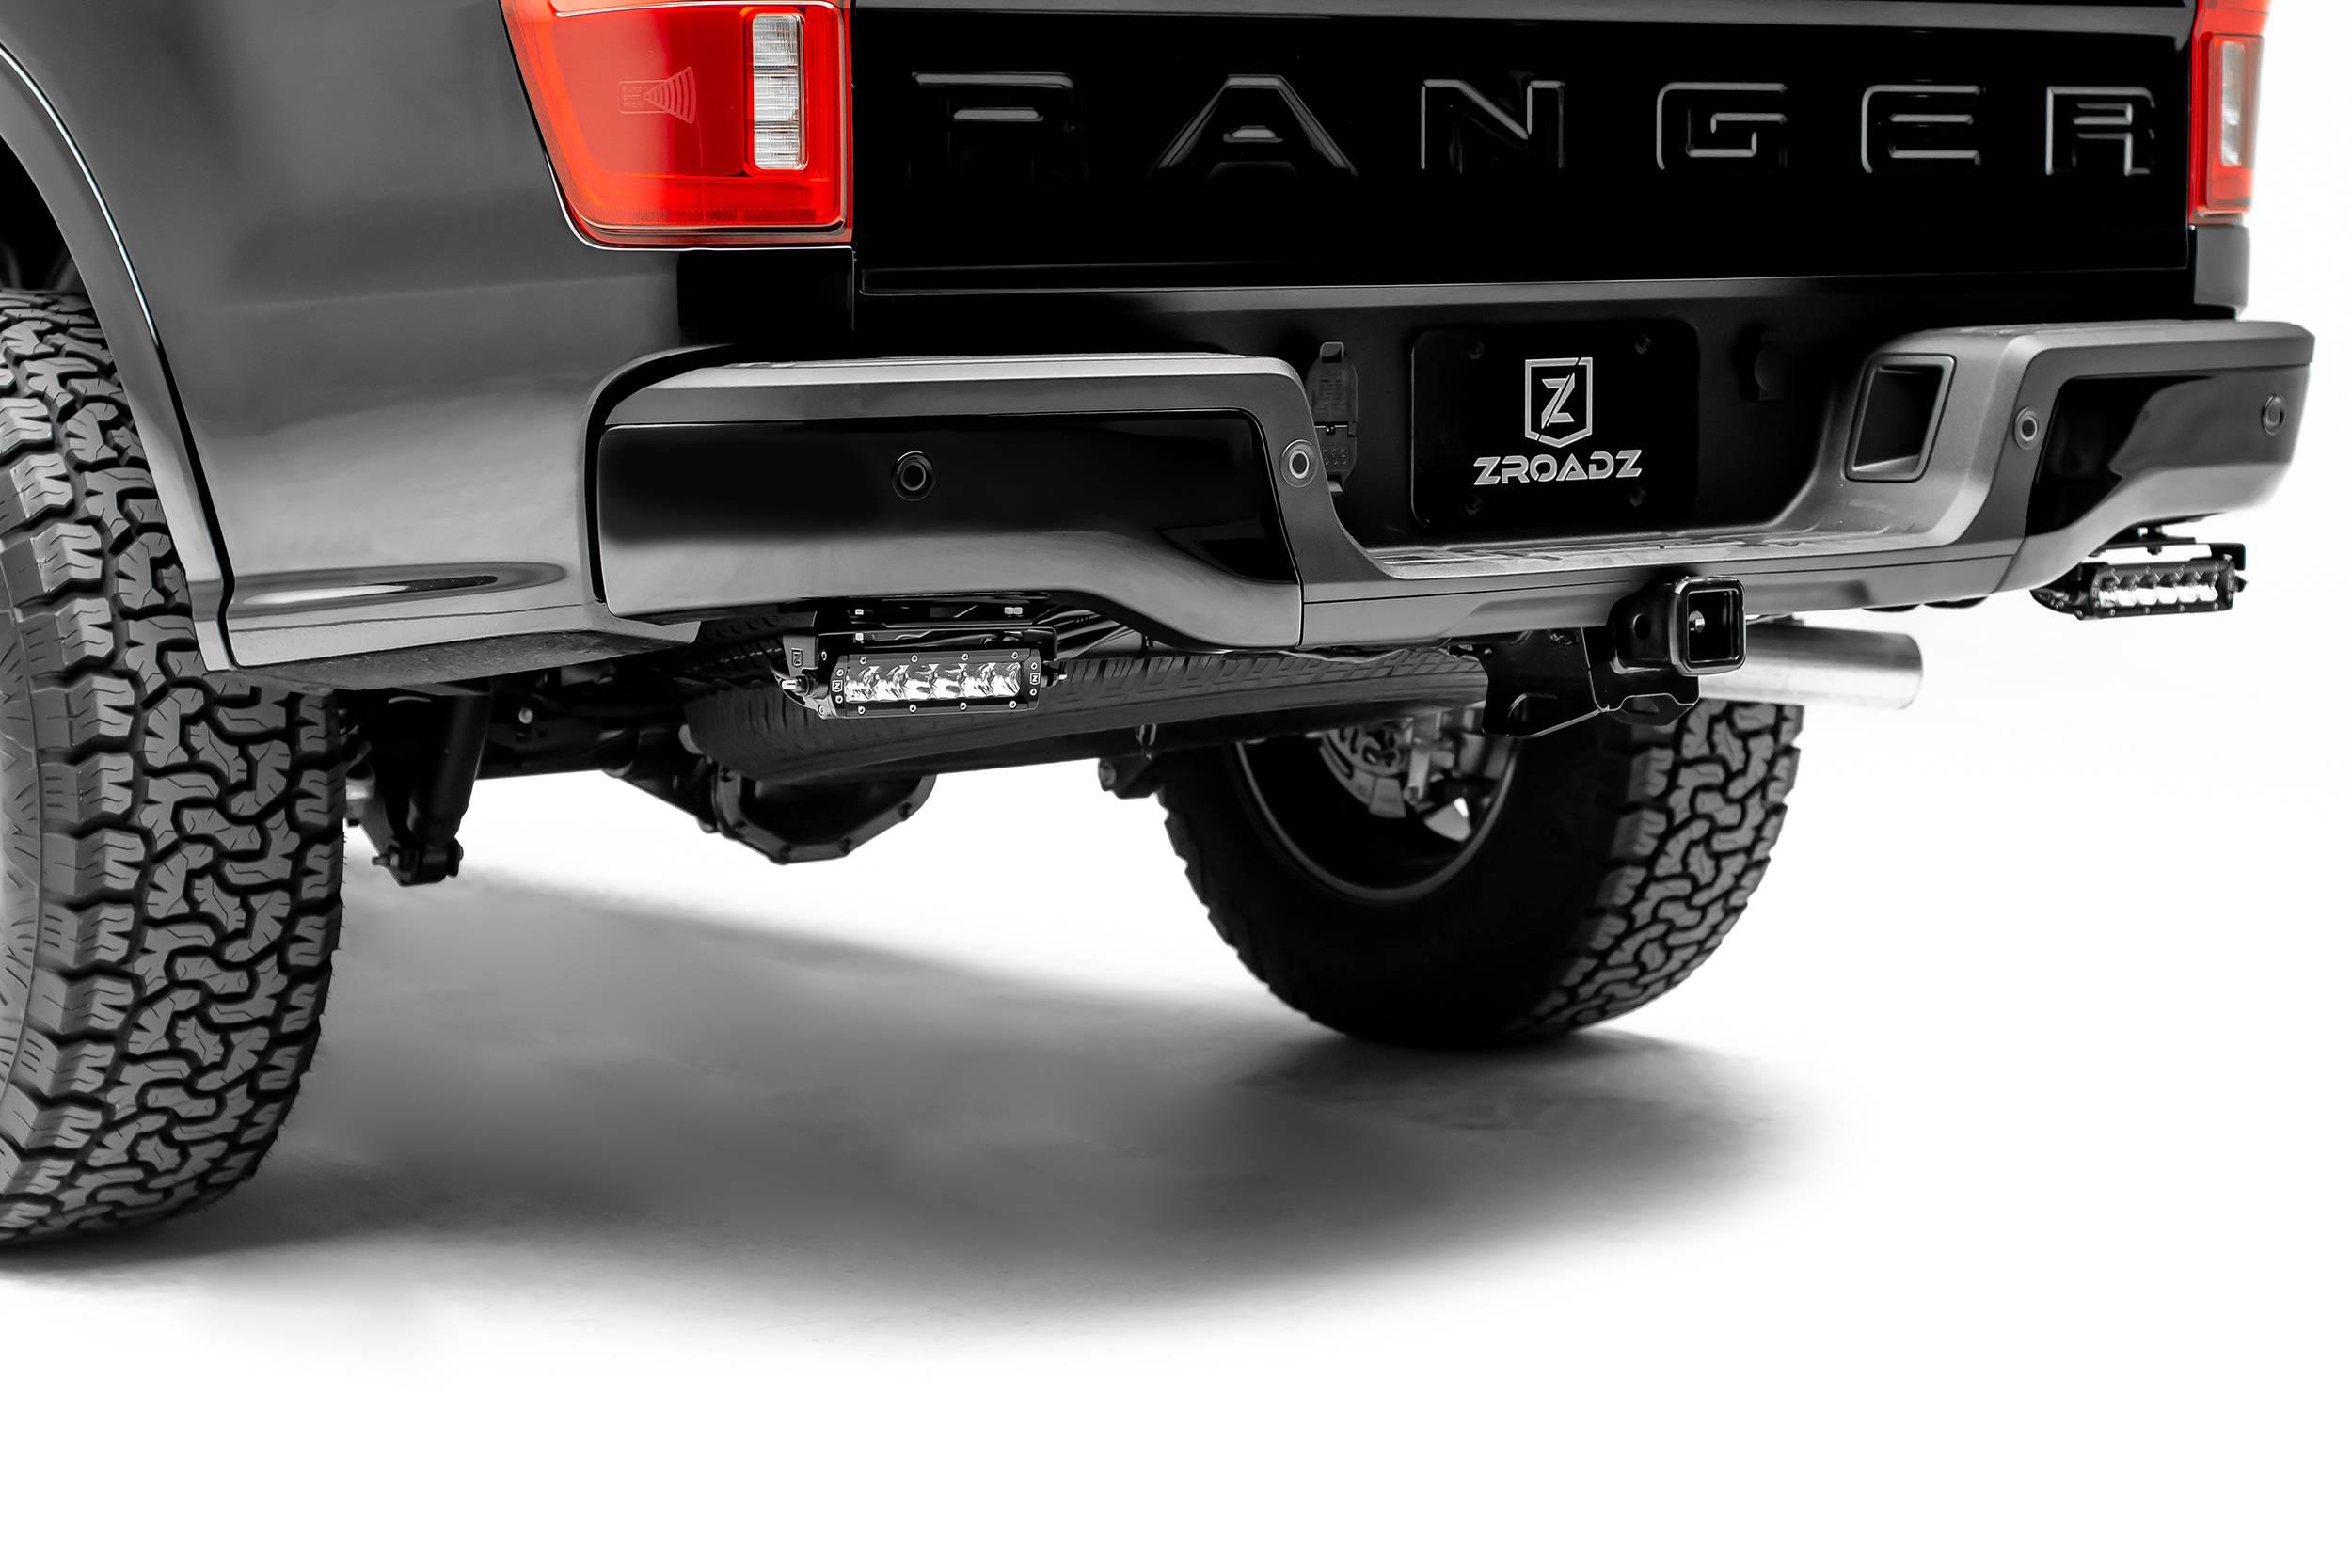 ZROADZ                                             - 2019-2020 Ford Ranger Rear Bumper LED Kit, Incl. (2) 6 Inch LED Straight Single Row Slim Light Bars - PN #Z385881-KIT